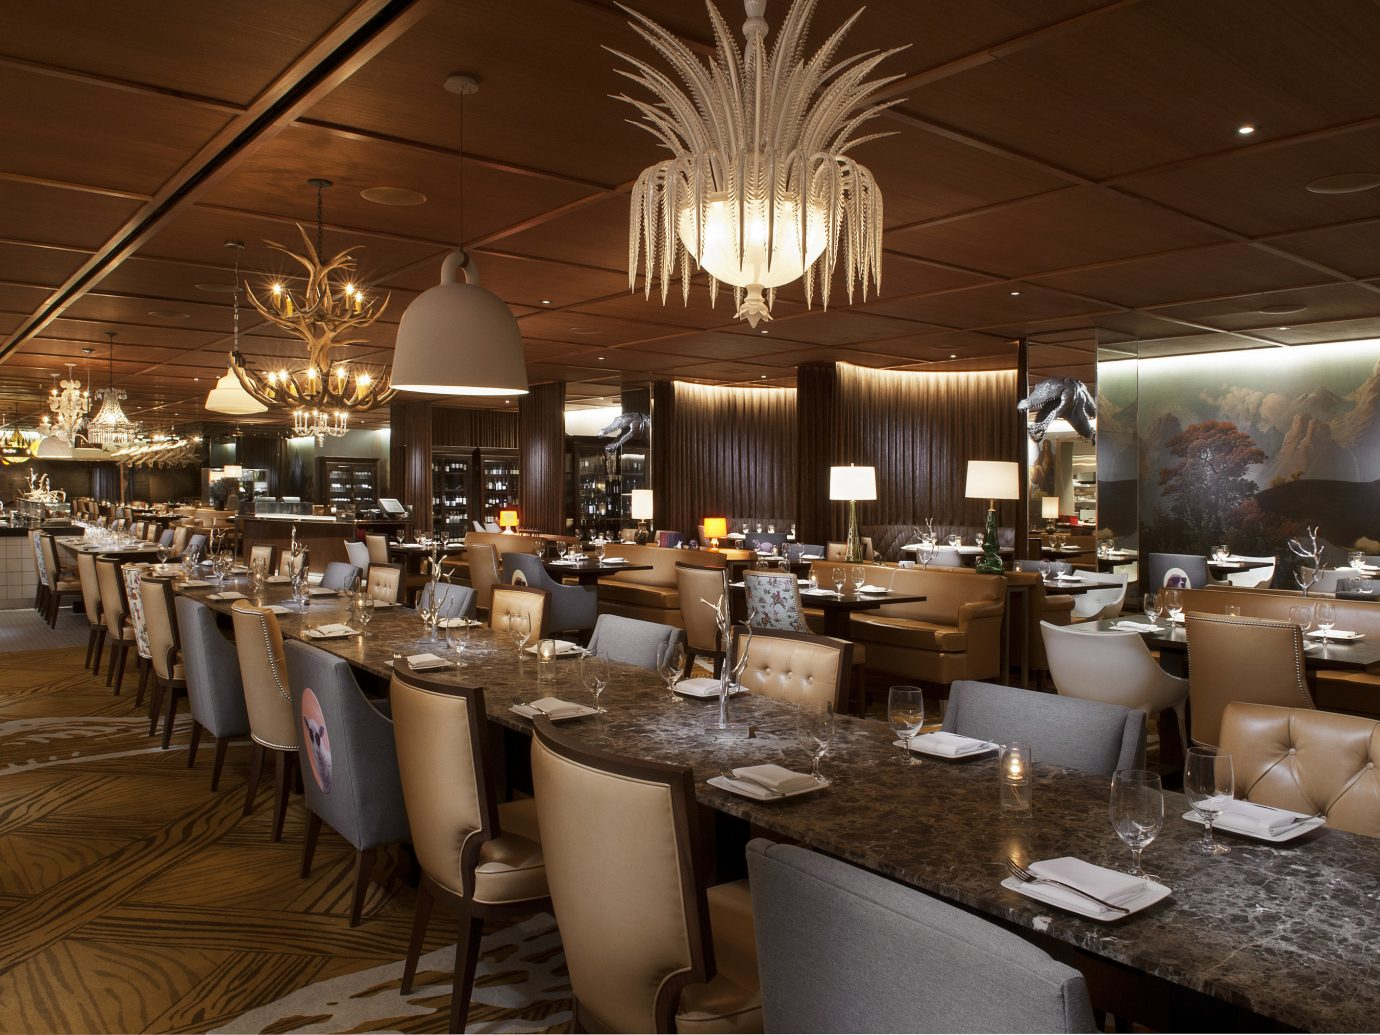 Trip Ideas table indoor meal function hall restaurant ceiling ballroom interior design wedding reception buffet banquet estate several